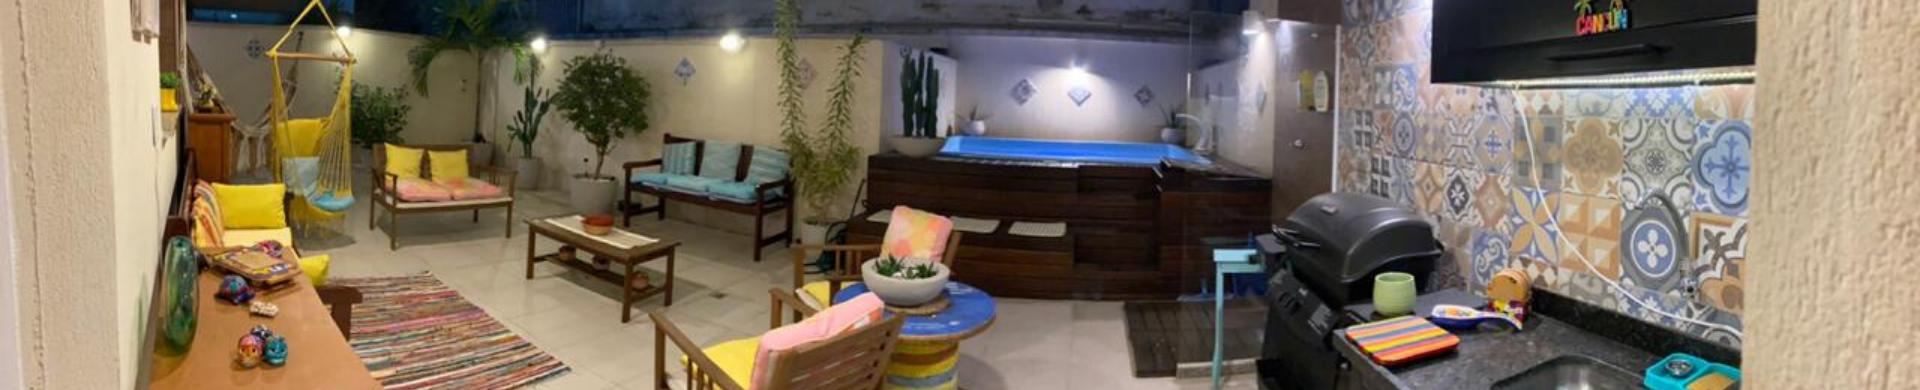 Apartamento Garden 03 quartos, 01 vaga, piscina com deck, Vila Isabel